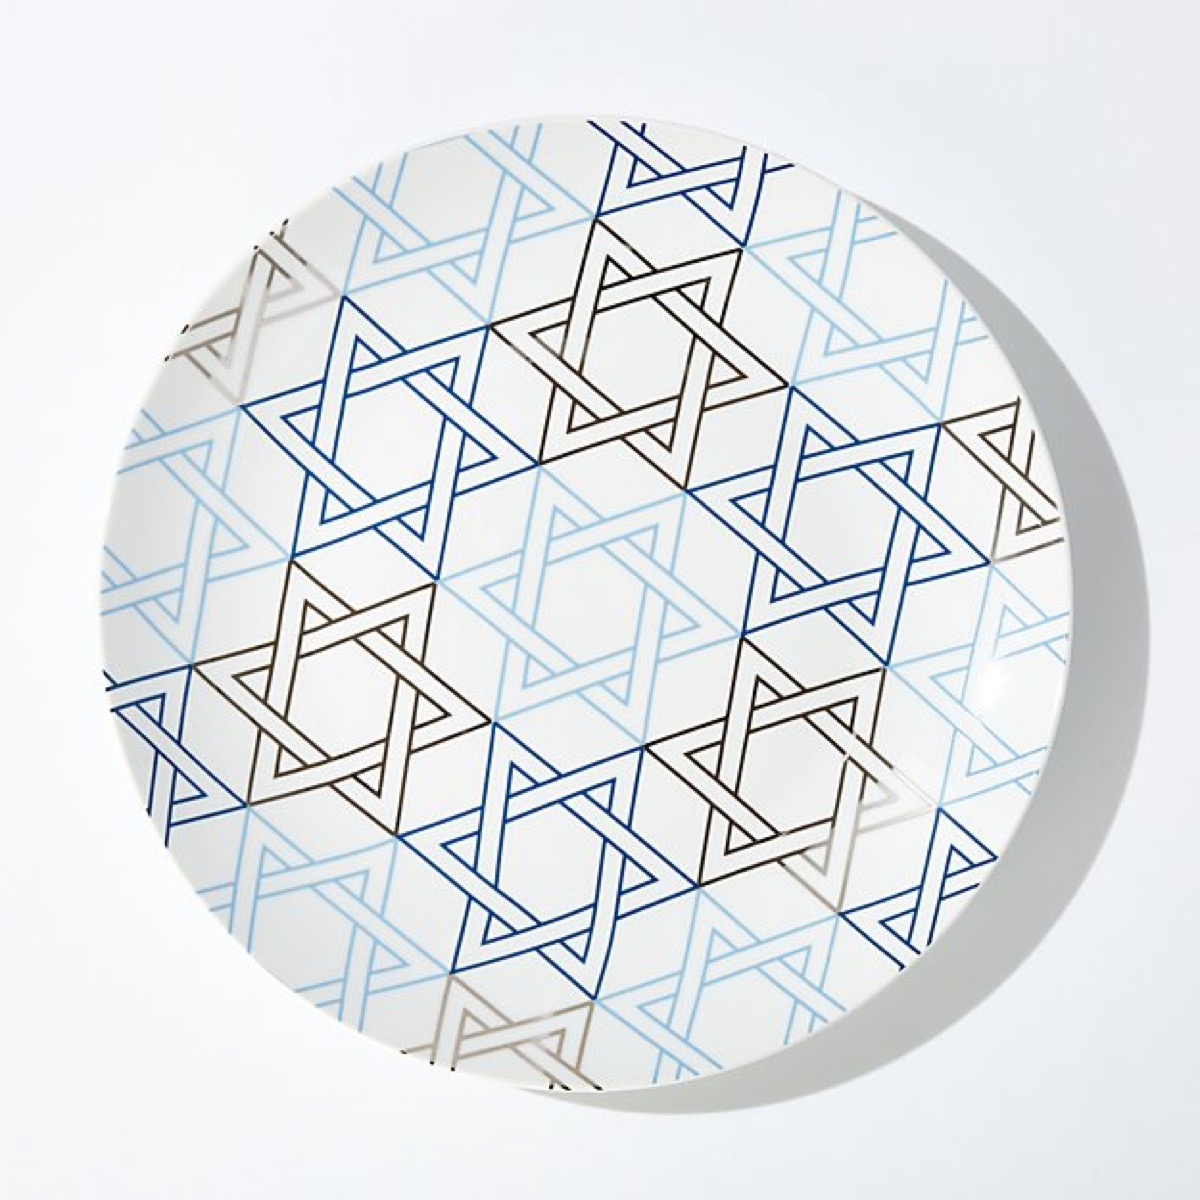 white platter with blue stars of david on it, hanukkah decorations